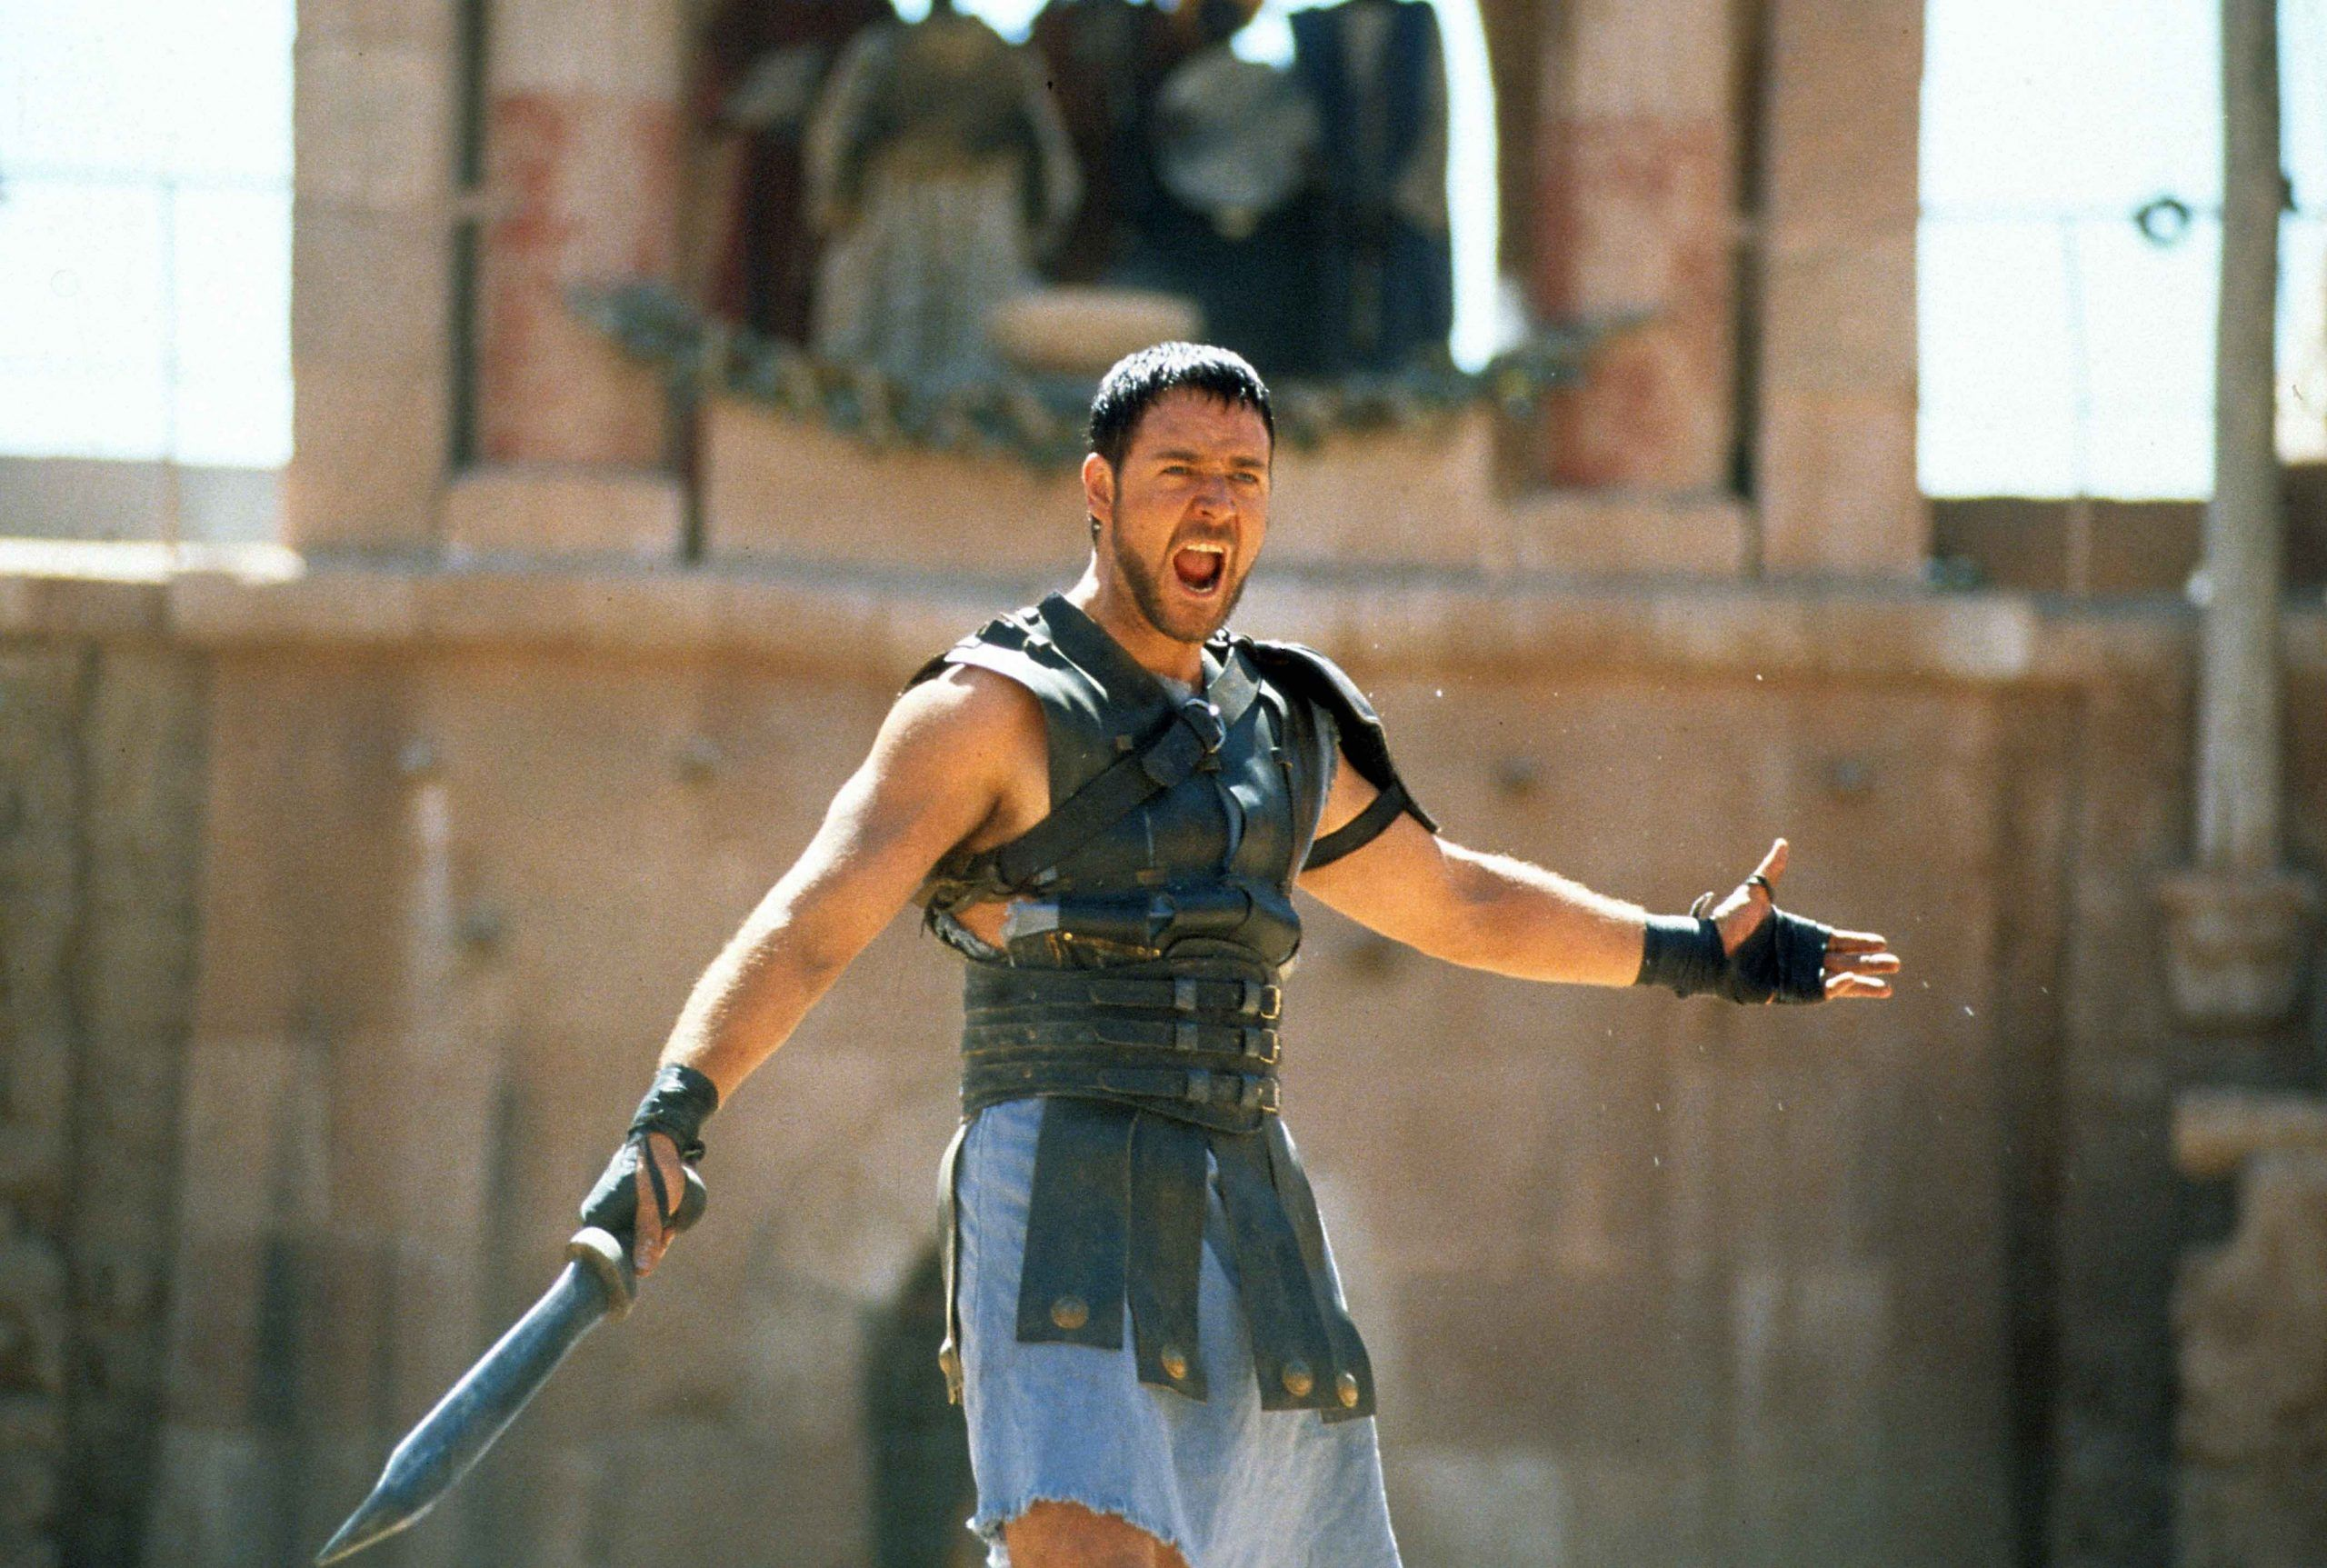 Gladiador-2000-Ridley-Scott-Russel-Crowe